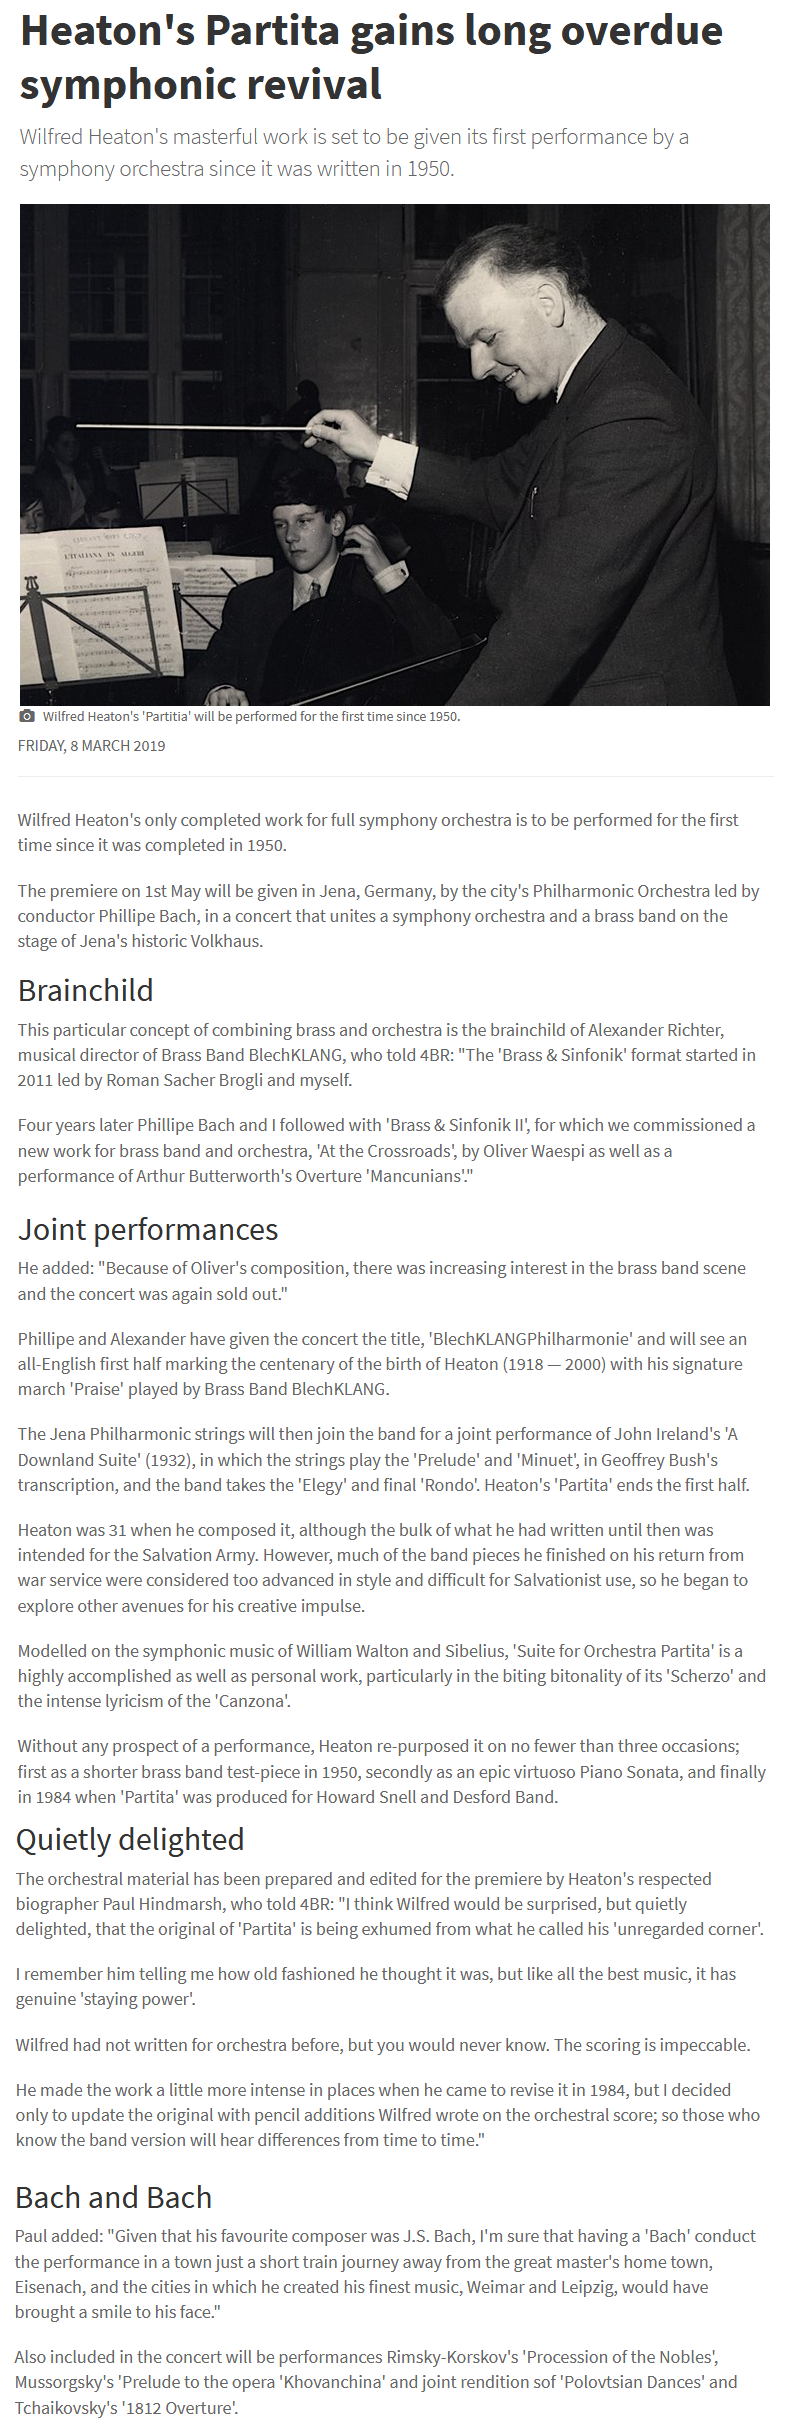 Artikel-4barsrest-Brass Band BlechKLANG musiziert mit Jenaer Philharmonie